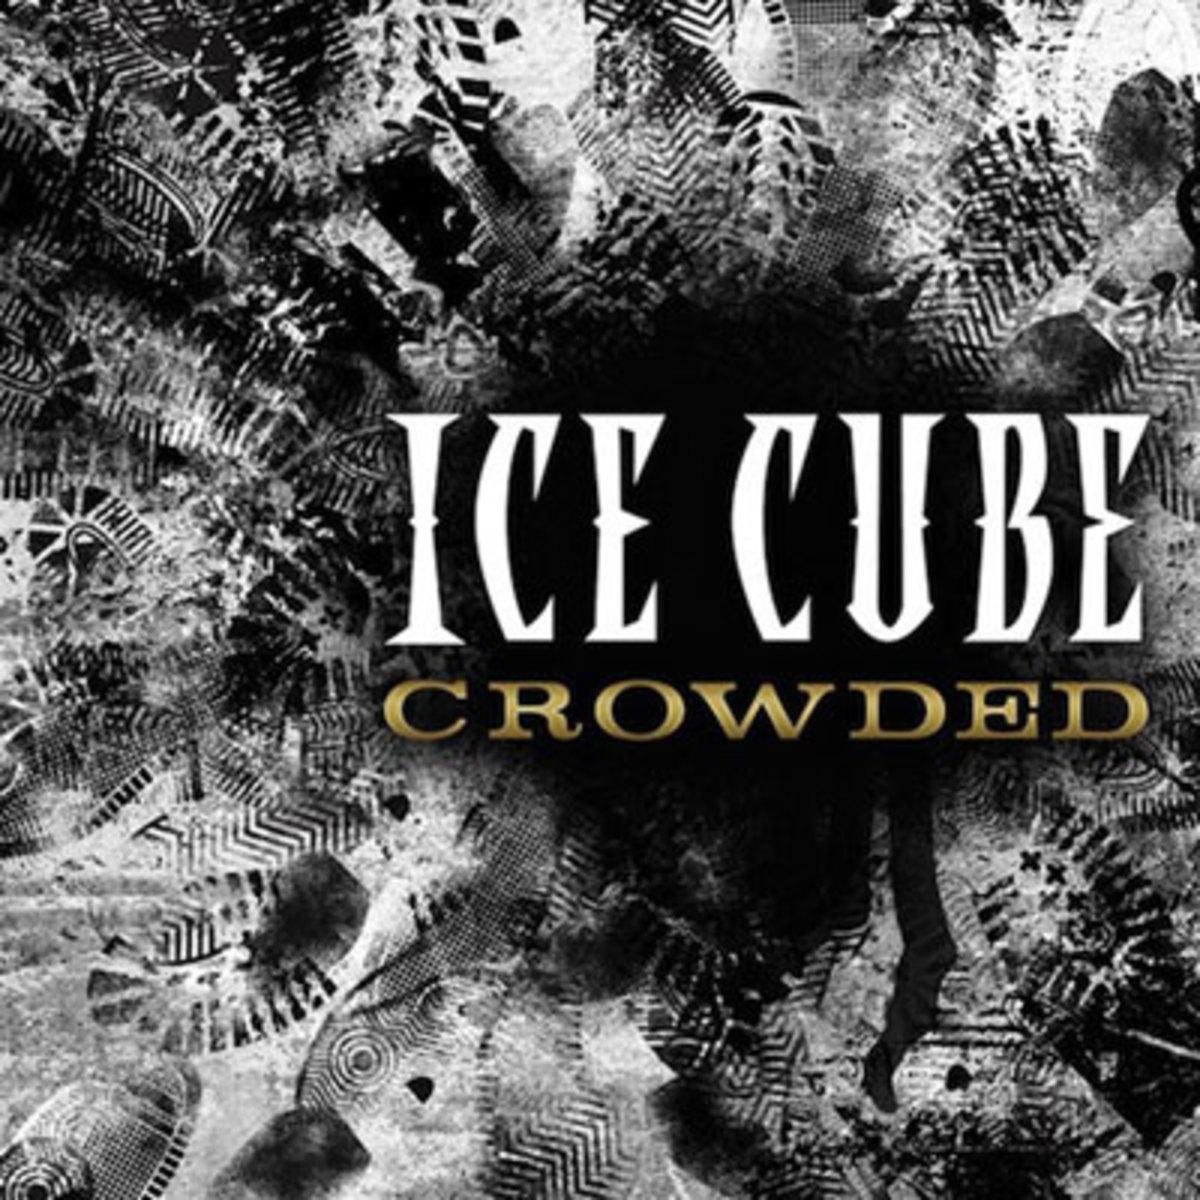 icecube-crowded.jpg